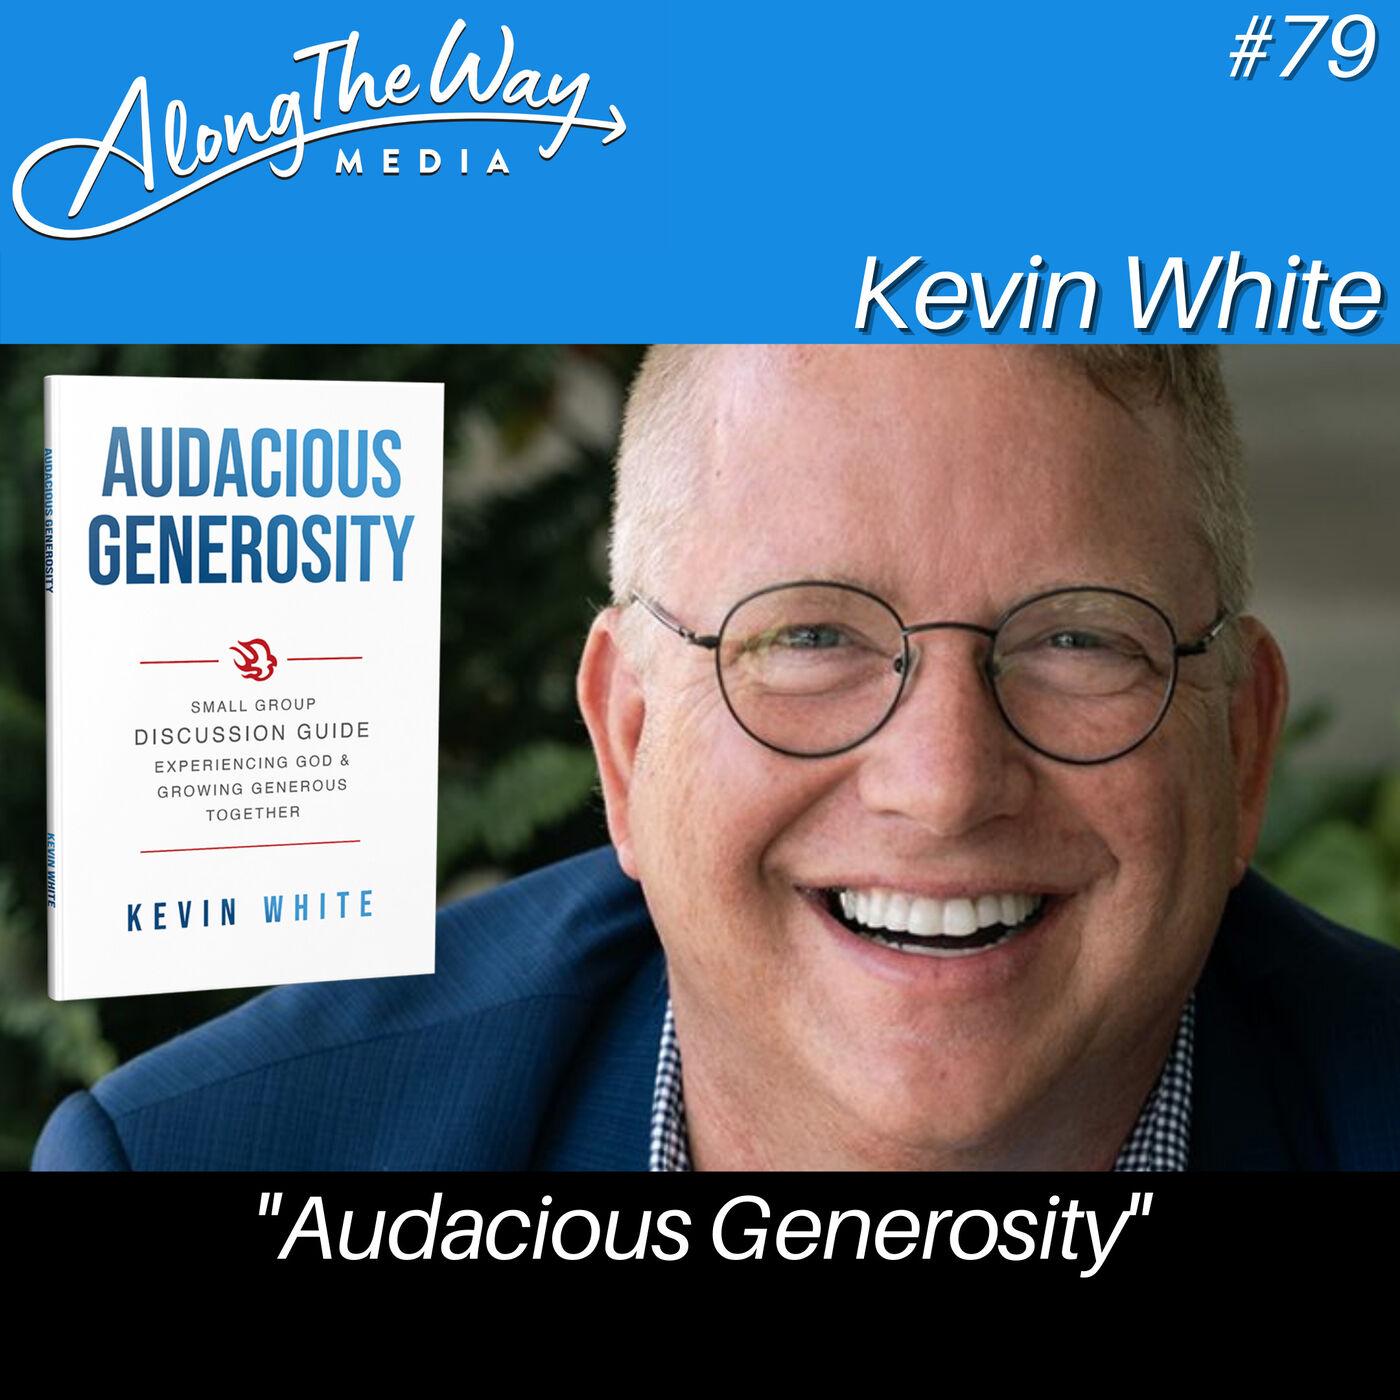 """Audacious Generosity"" - Kevin White AlongTheWay 79"